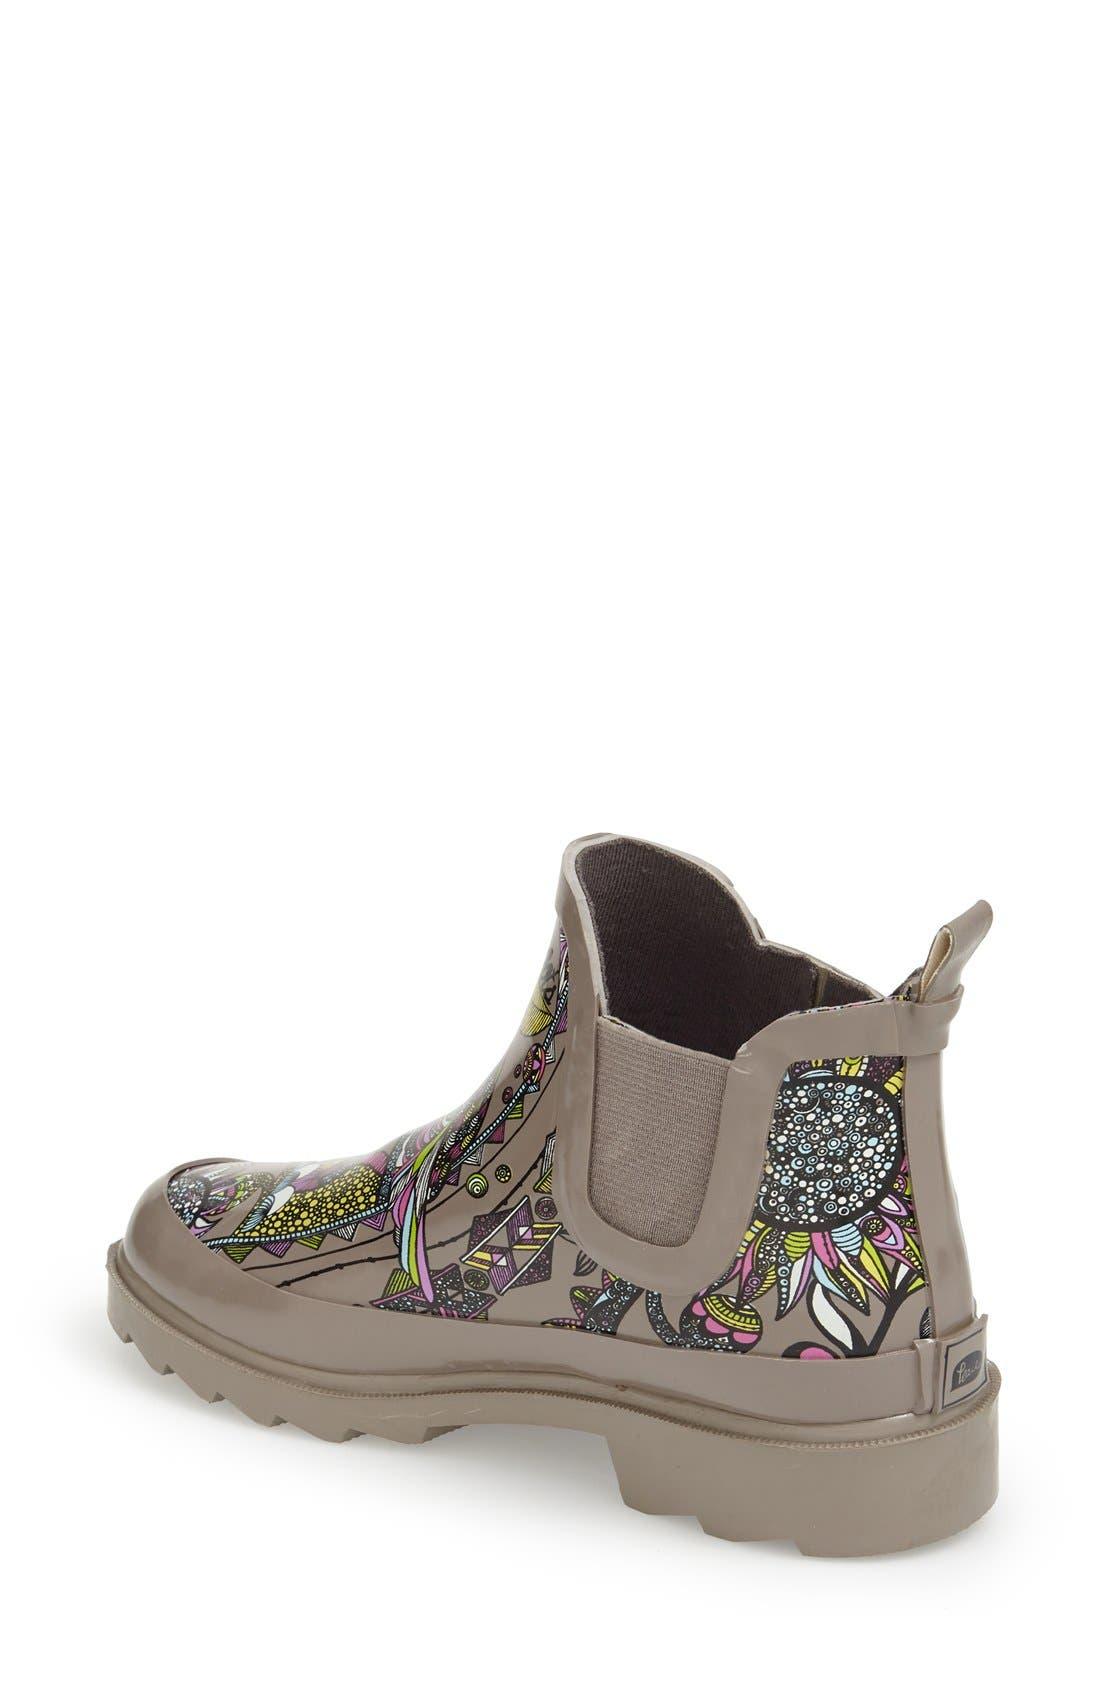 'Rhyme' Waterproof Rain Boot,                             Alternate thumbnail 32, color,